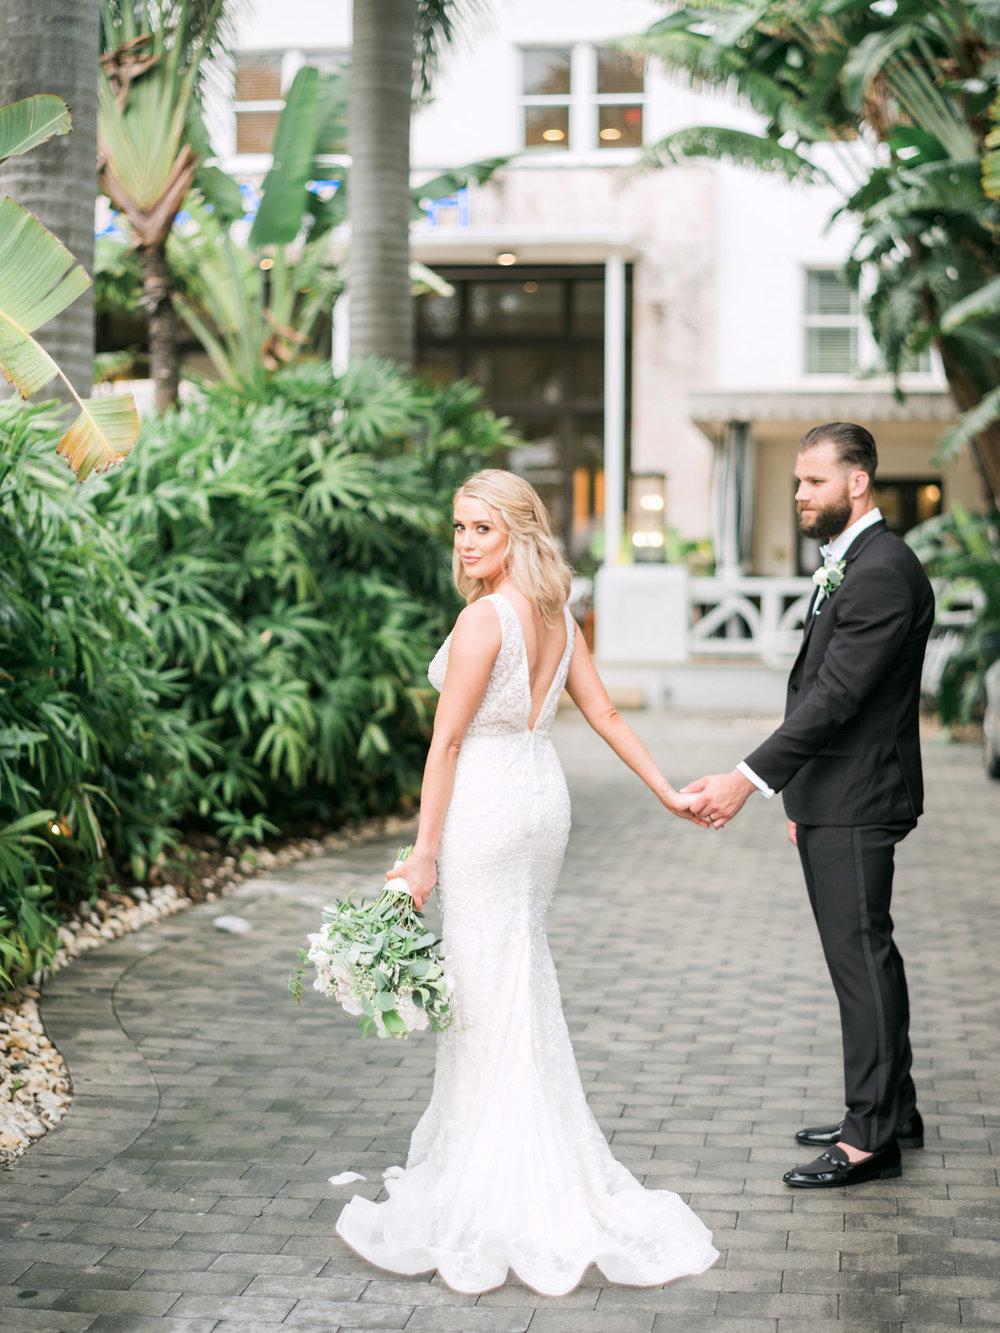 raleigh-miami-beach-destination-film-wedding-1351.jpg